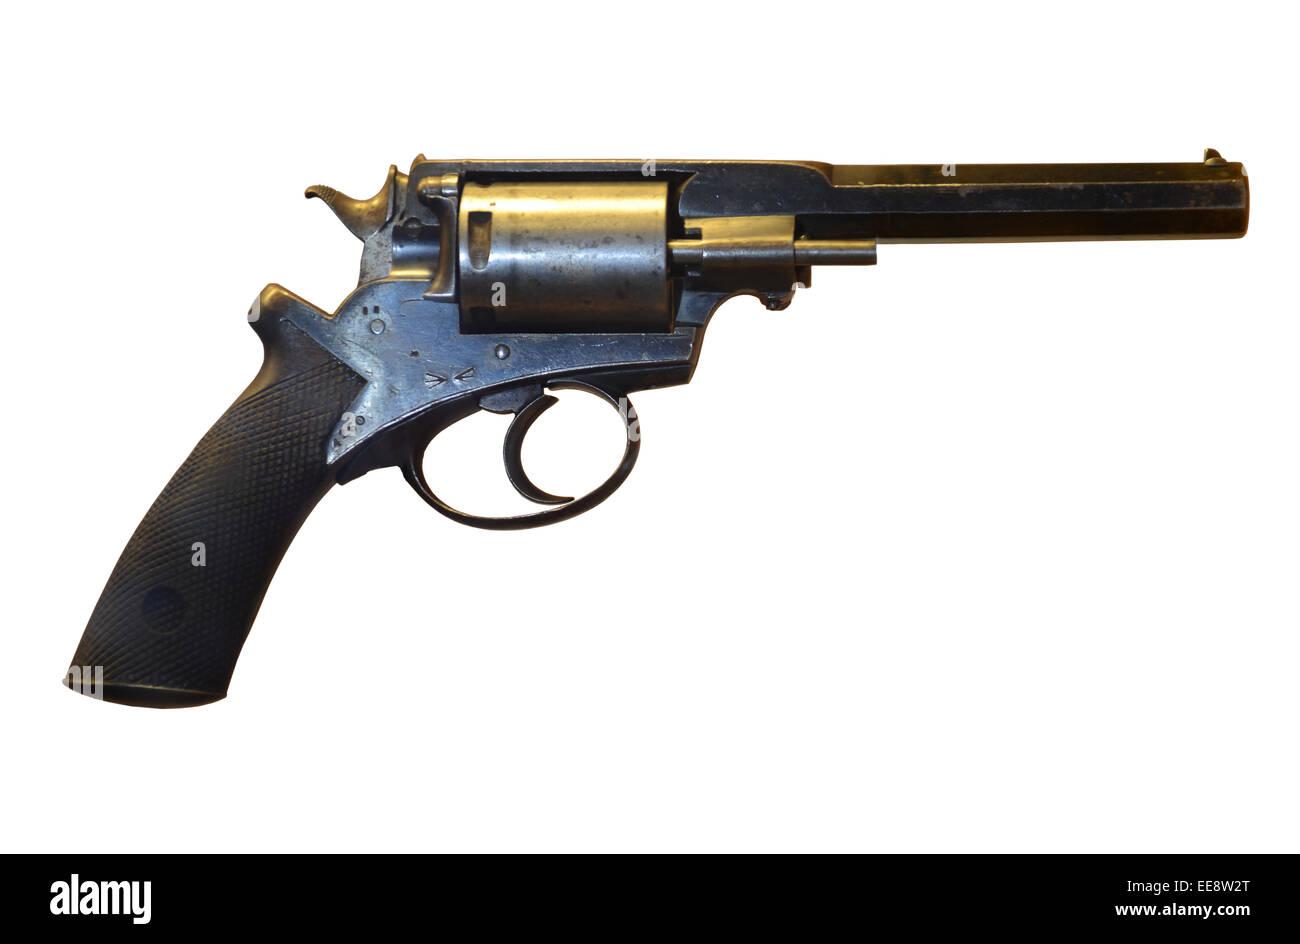 Adams Mark II revolver, gun, pistol on white background - Stock Image